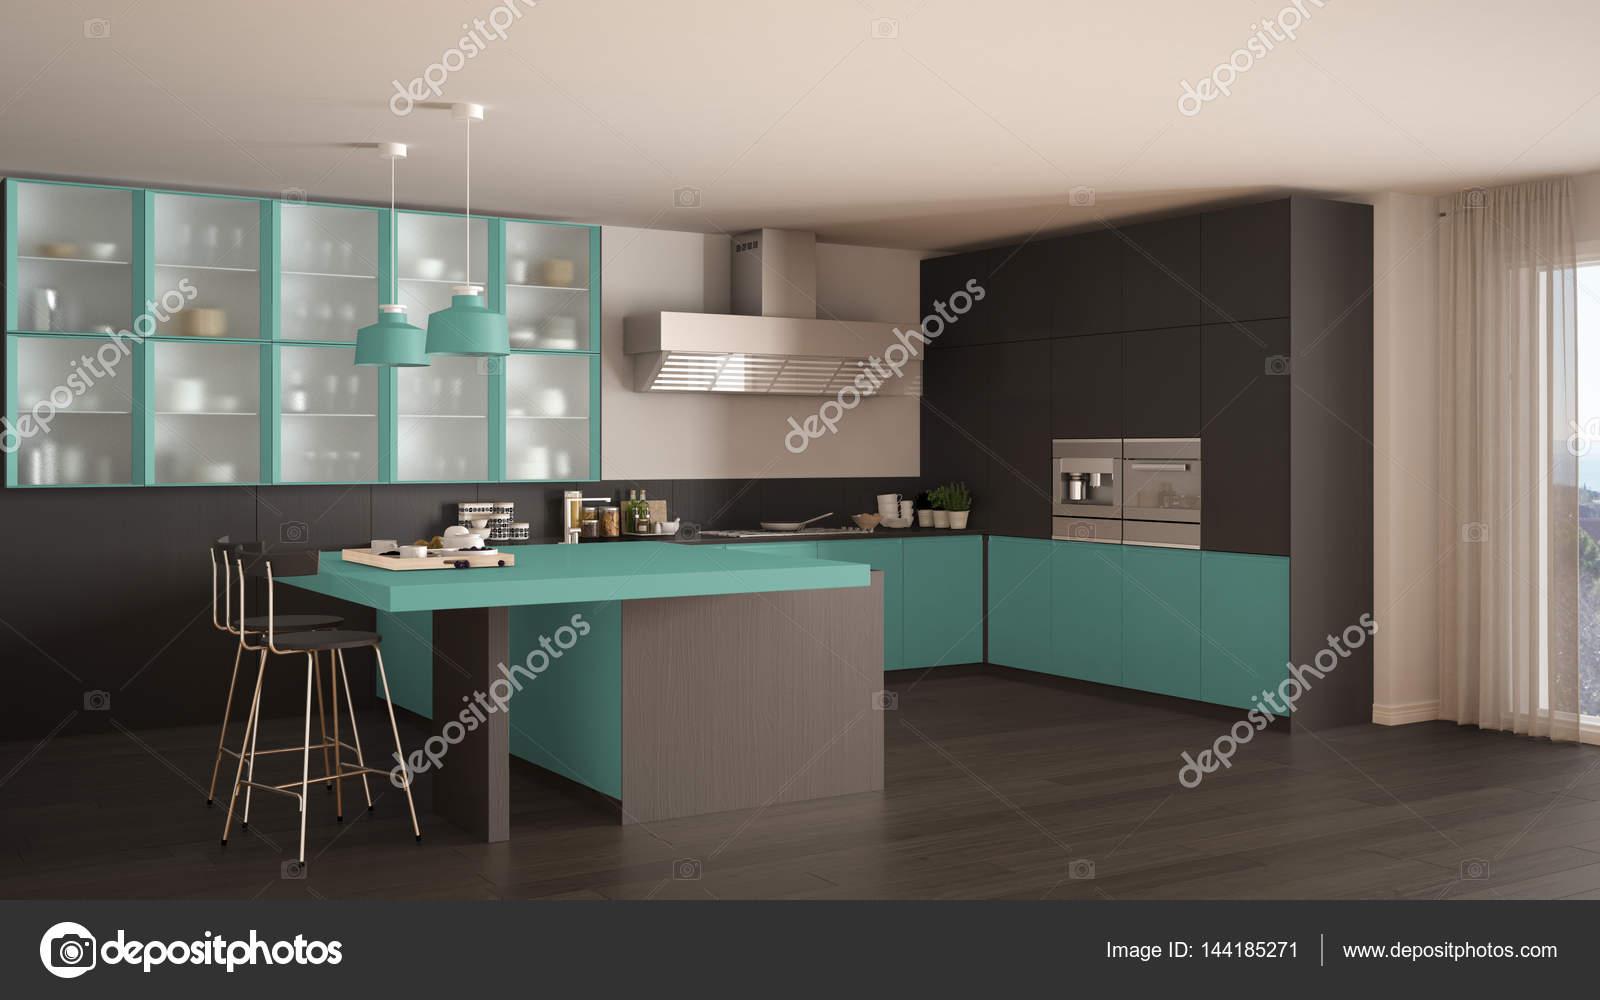 Cuisine Avec Parquet Gris classic minimal gray and turquoise kitchen with parquet